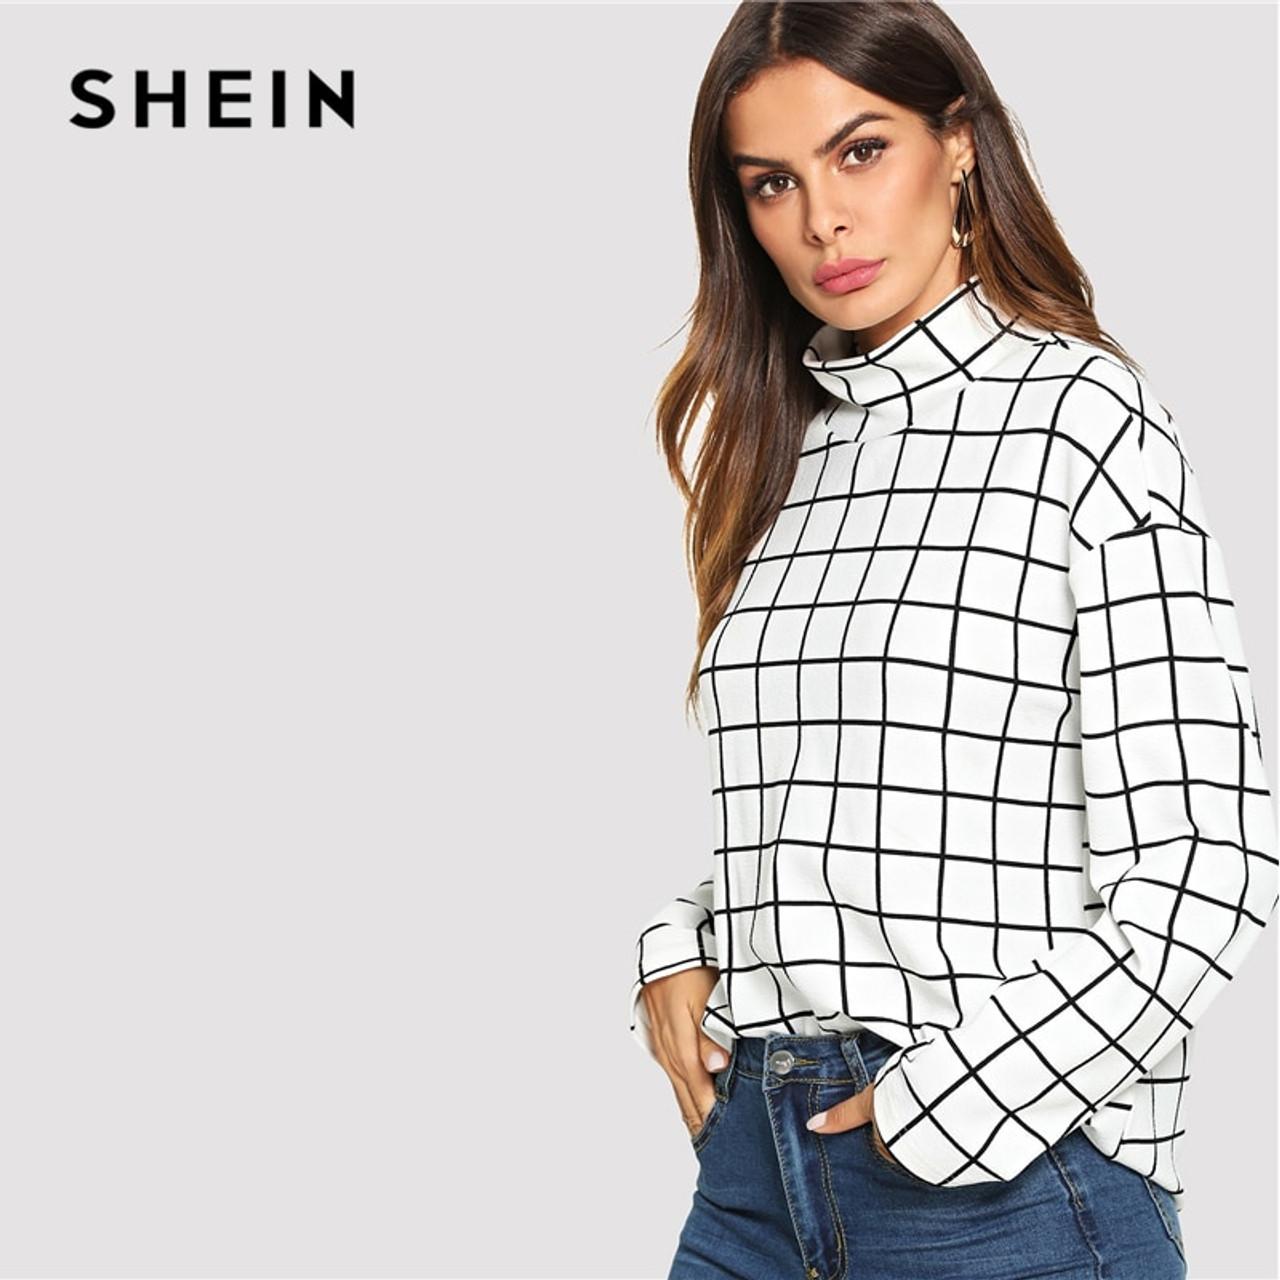 f4836c4cca6 ... SHEIN Black and White High Neck Plaid Grid Print Blouse Elegant Long  Sleeve Highstreet Blouses Women ...